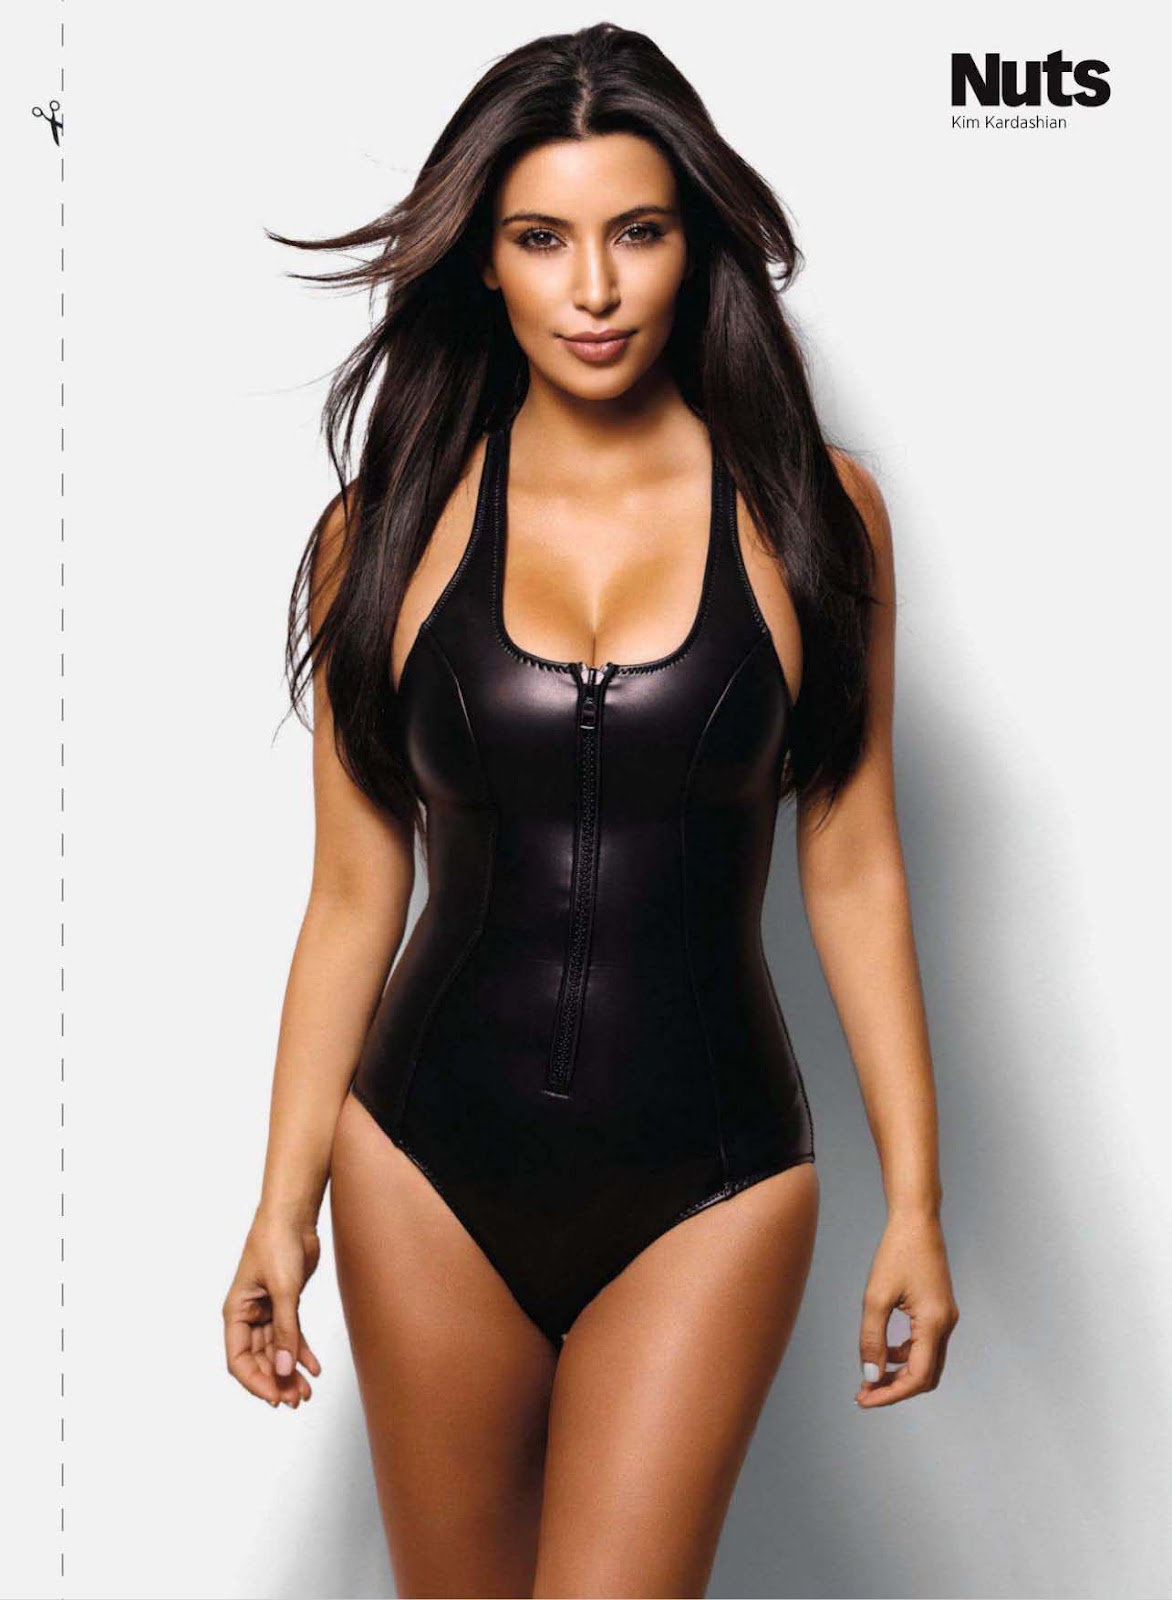 http://2.bp.blogspot.com/-bqZRNqaPSLo/UFirTehFoXI/AAAAAAAA_Gg/dgRHcZHOLBY/s1600/Kim+Kardashian+in+Nuts-06.jpg